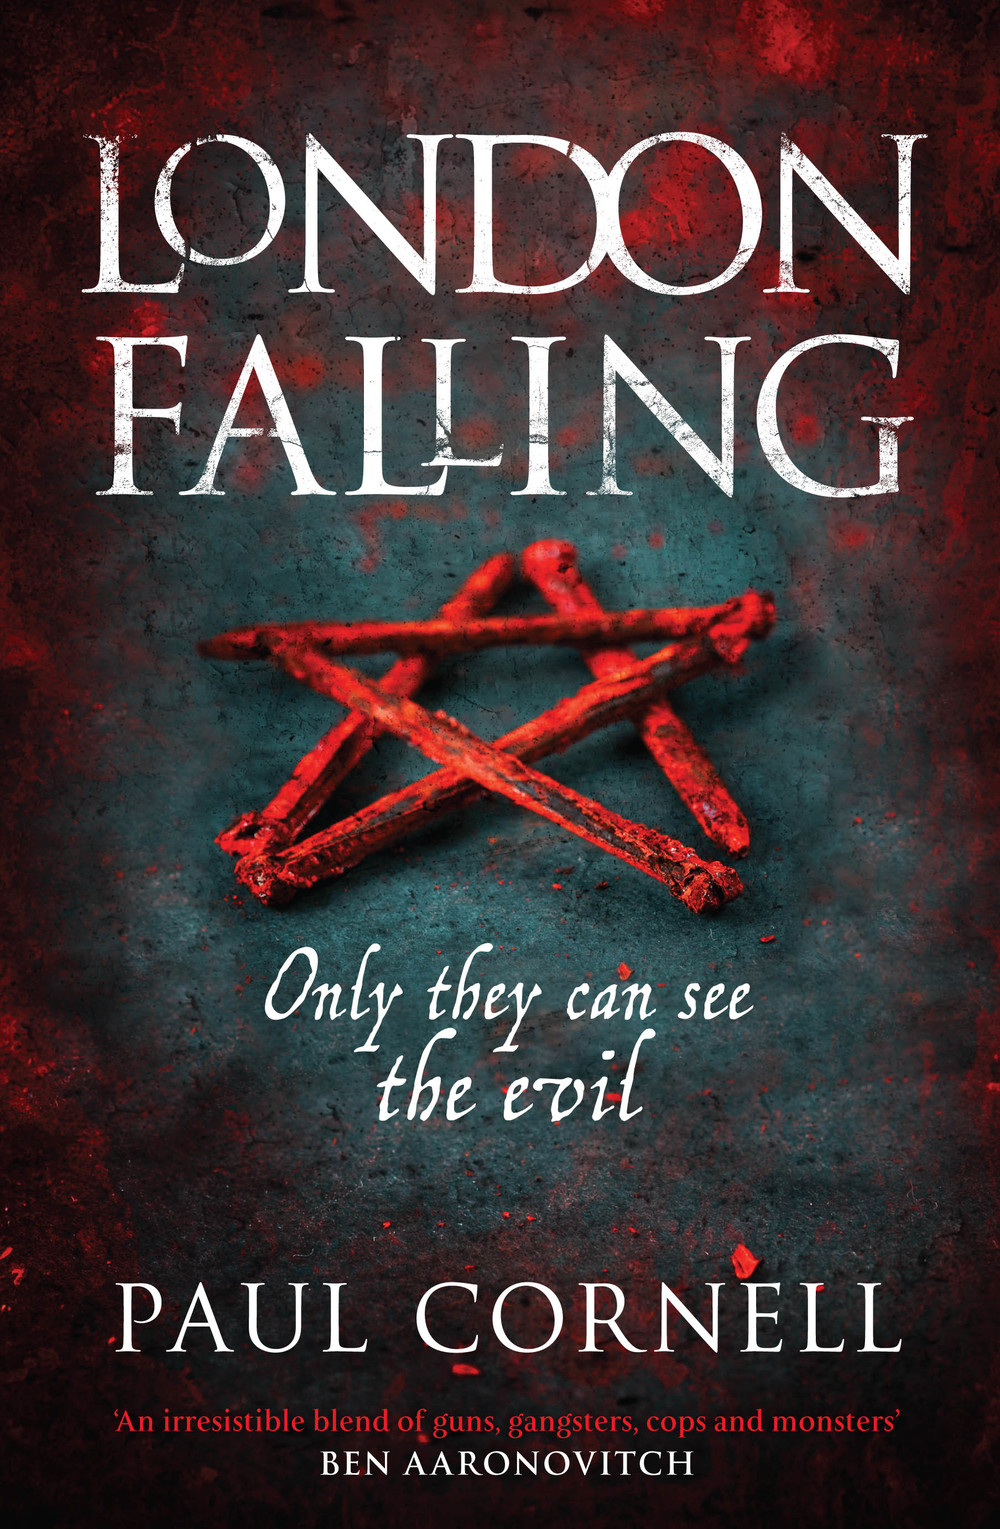 london Falling fc